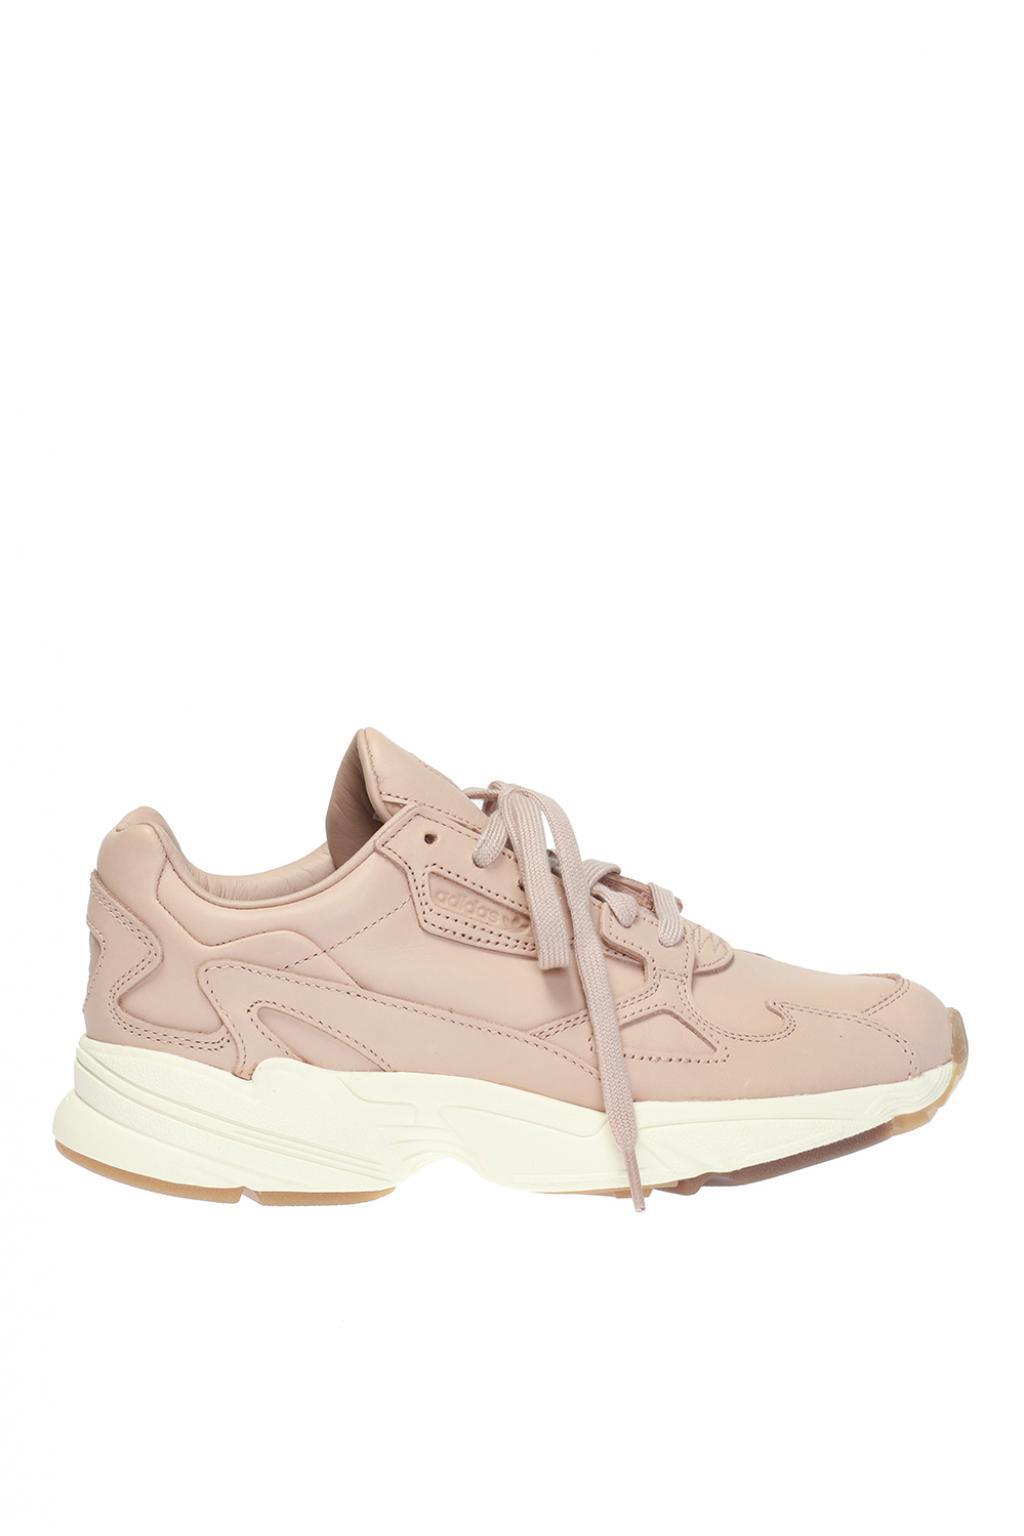 wholesale dealer 7b368 2a9e5 adidas Originals. Womens Pink falcon W Sneakers